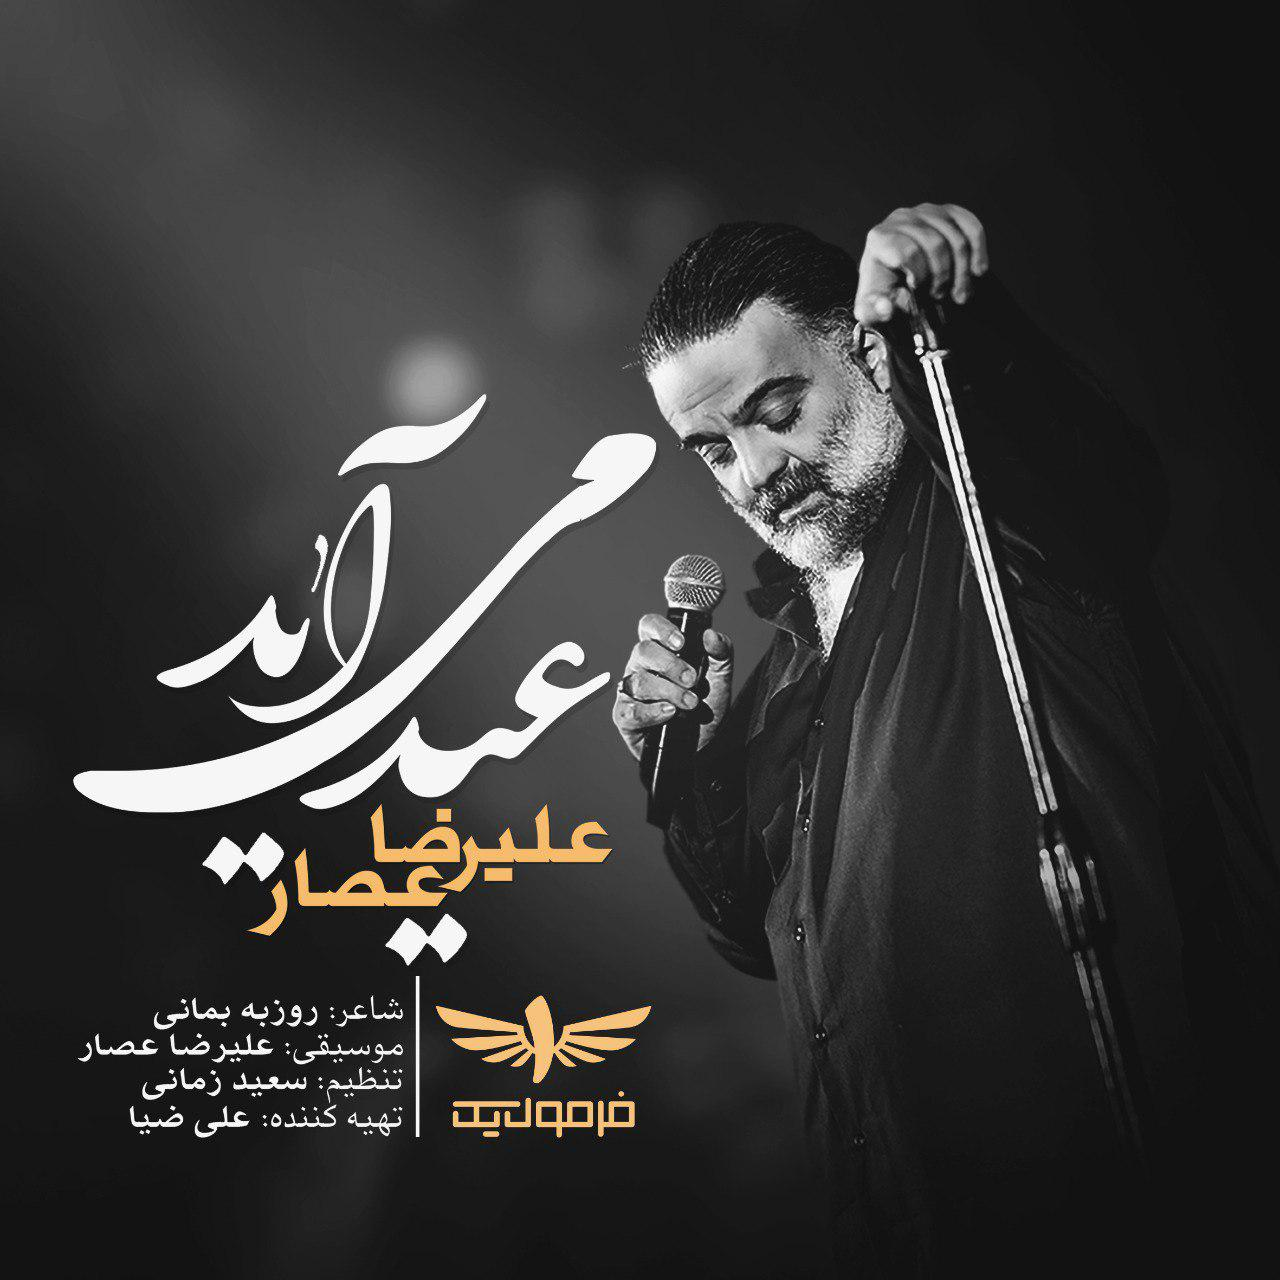 Alireza Assar Eyd Miayad | آهنگ   علیرضا عصار به نام عید می آید